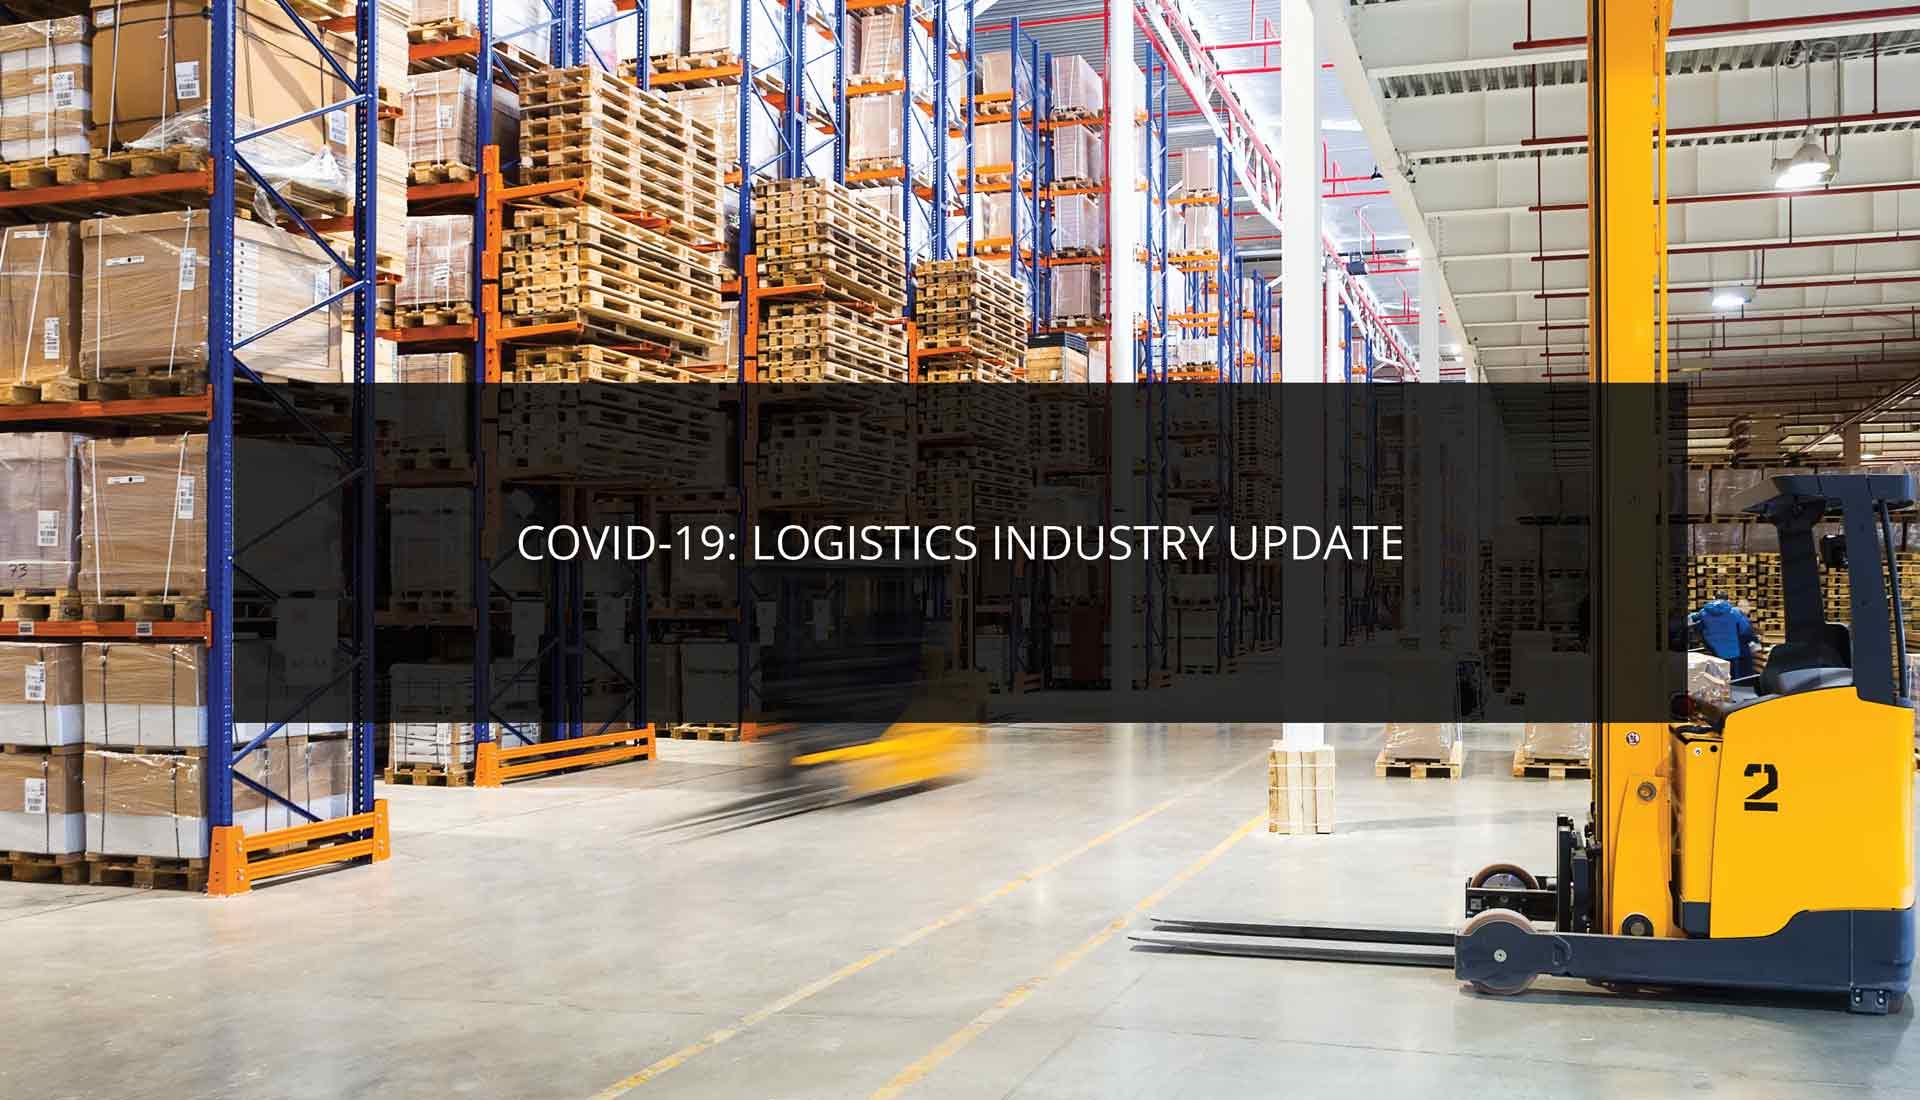 COVID-19: Logistics Industry Update